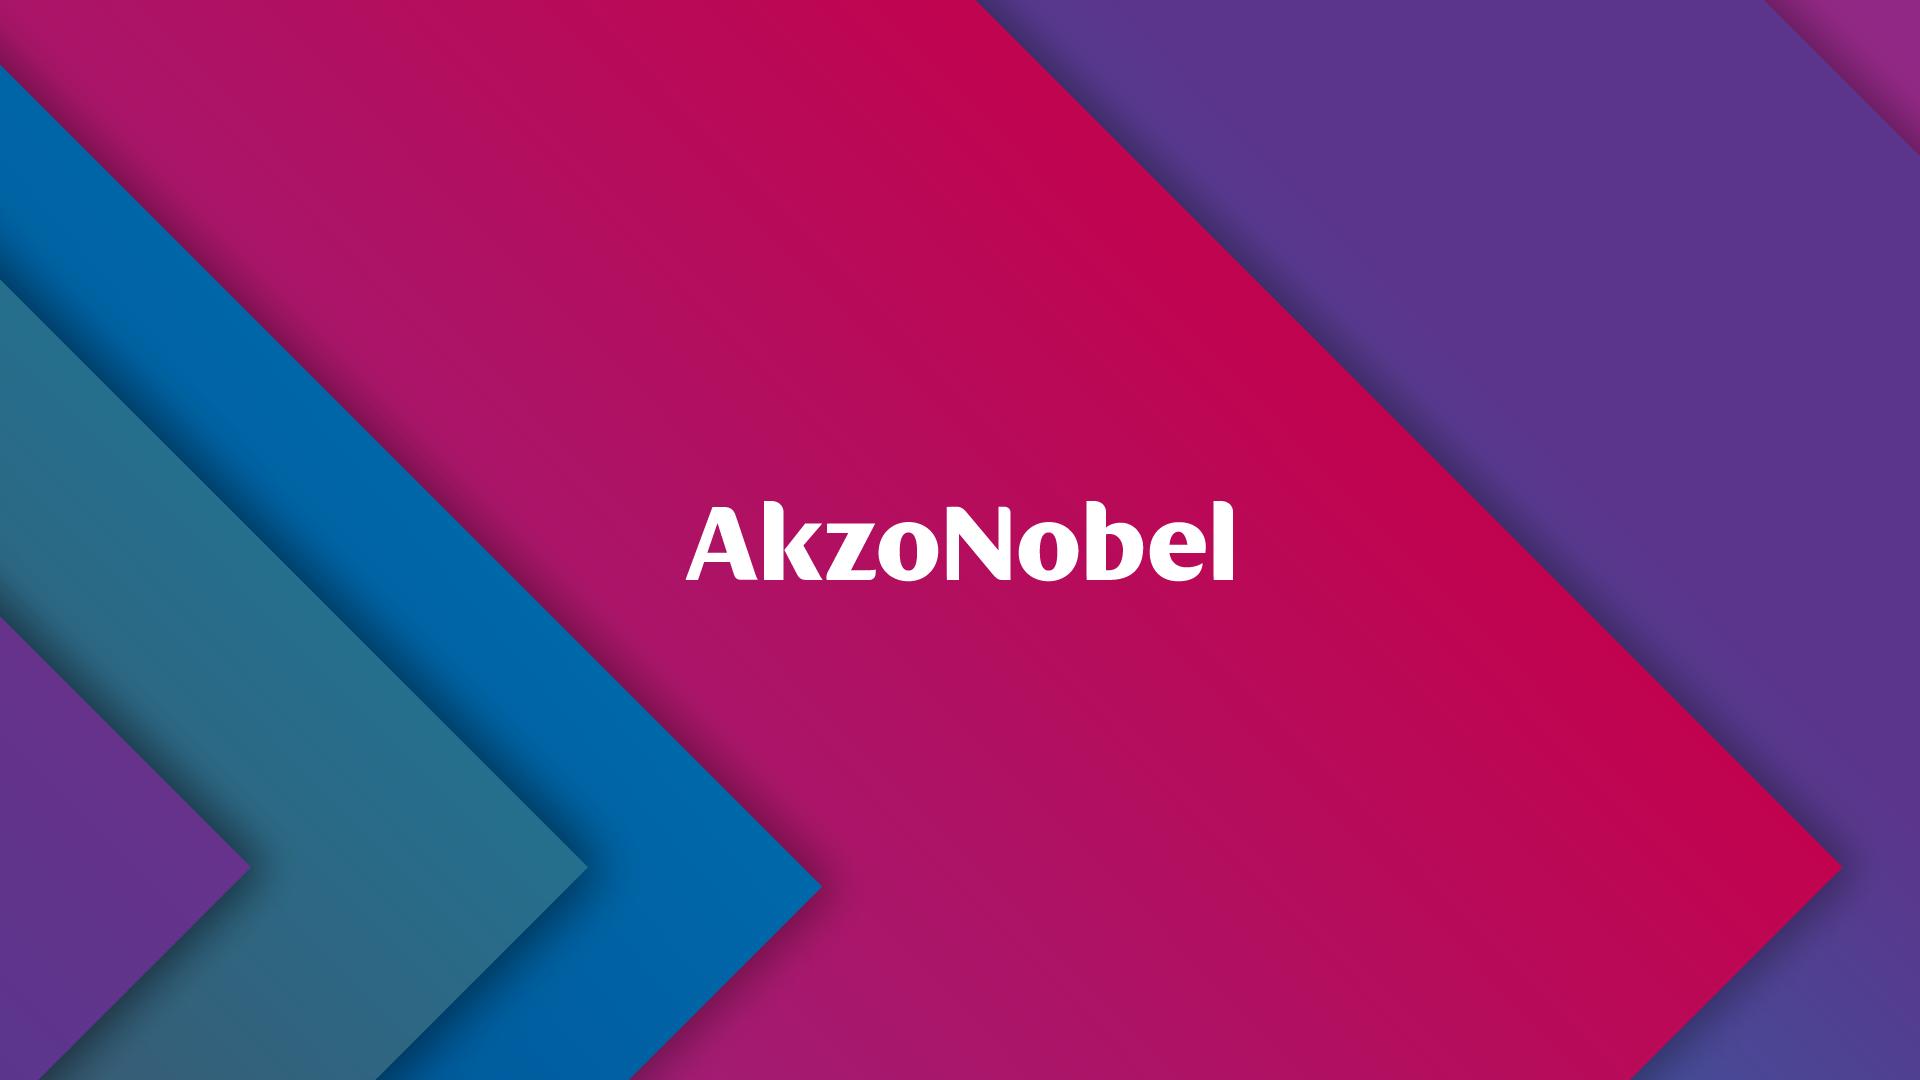 AkzoHeader